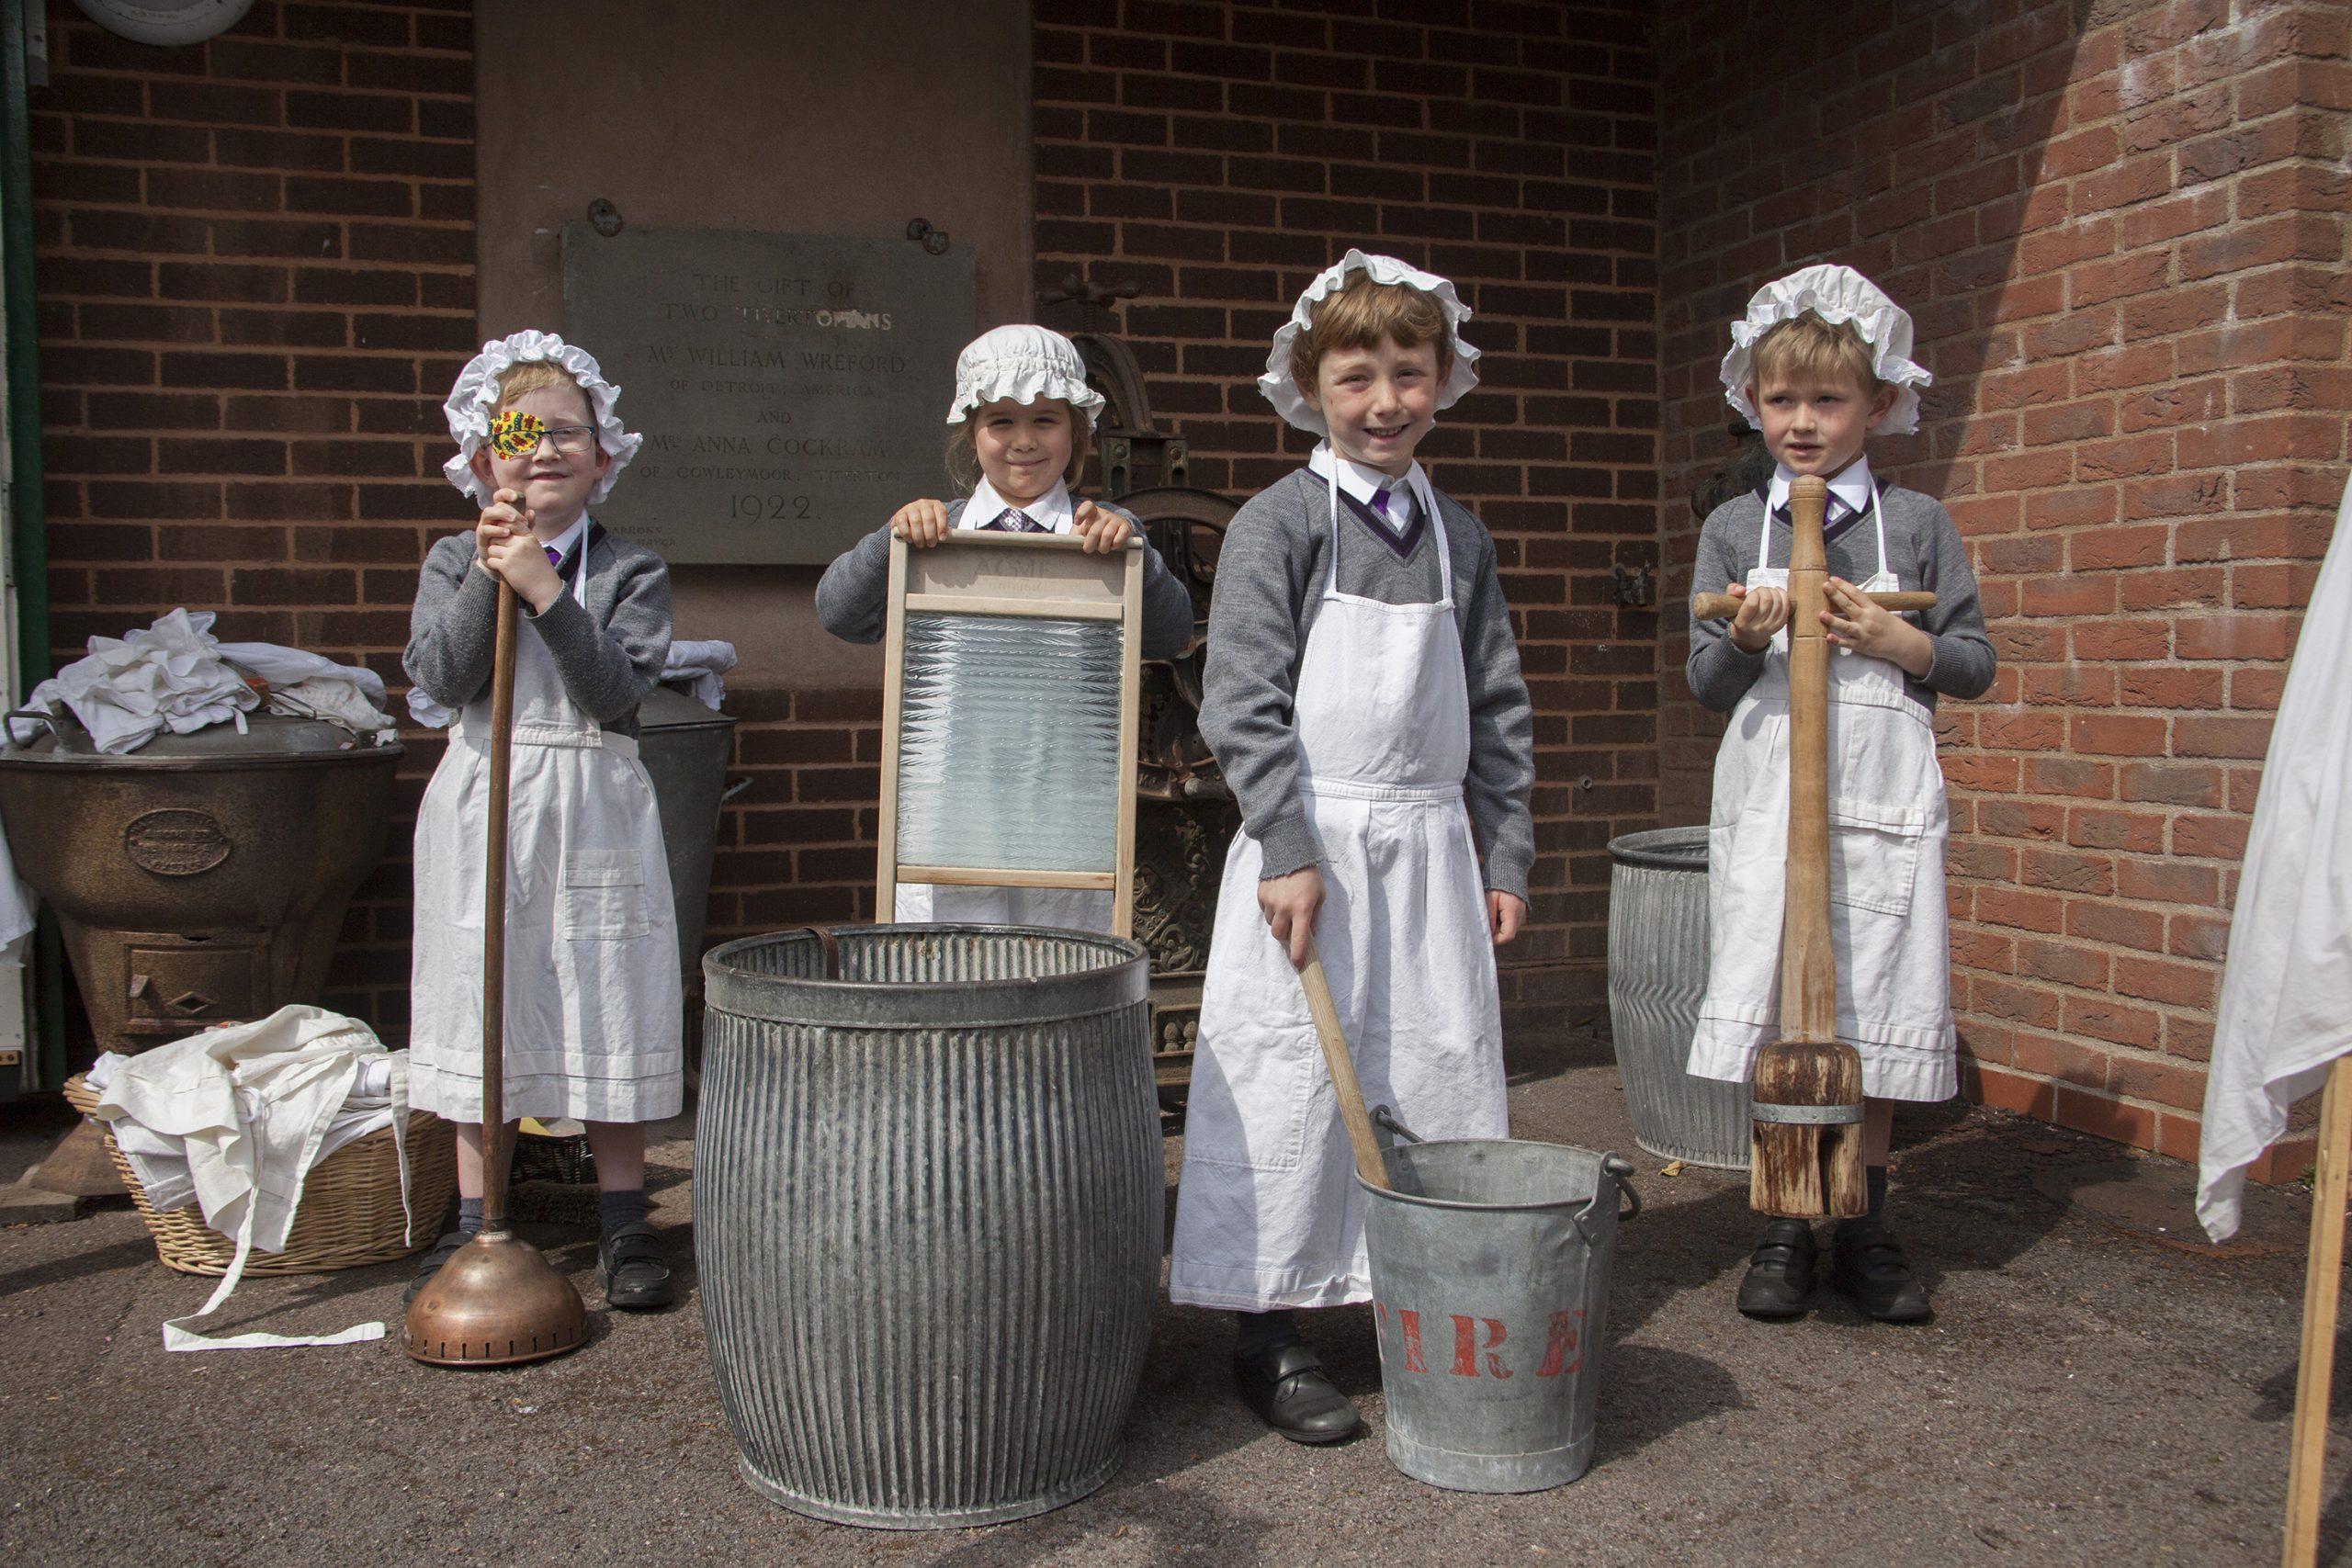 School children posing with Victorian laundry equipment